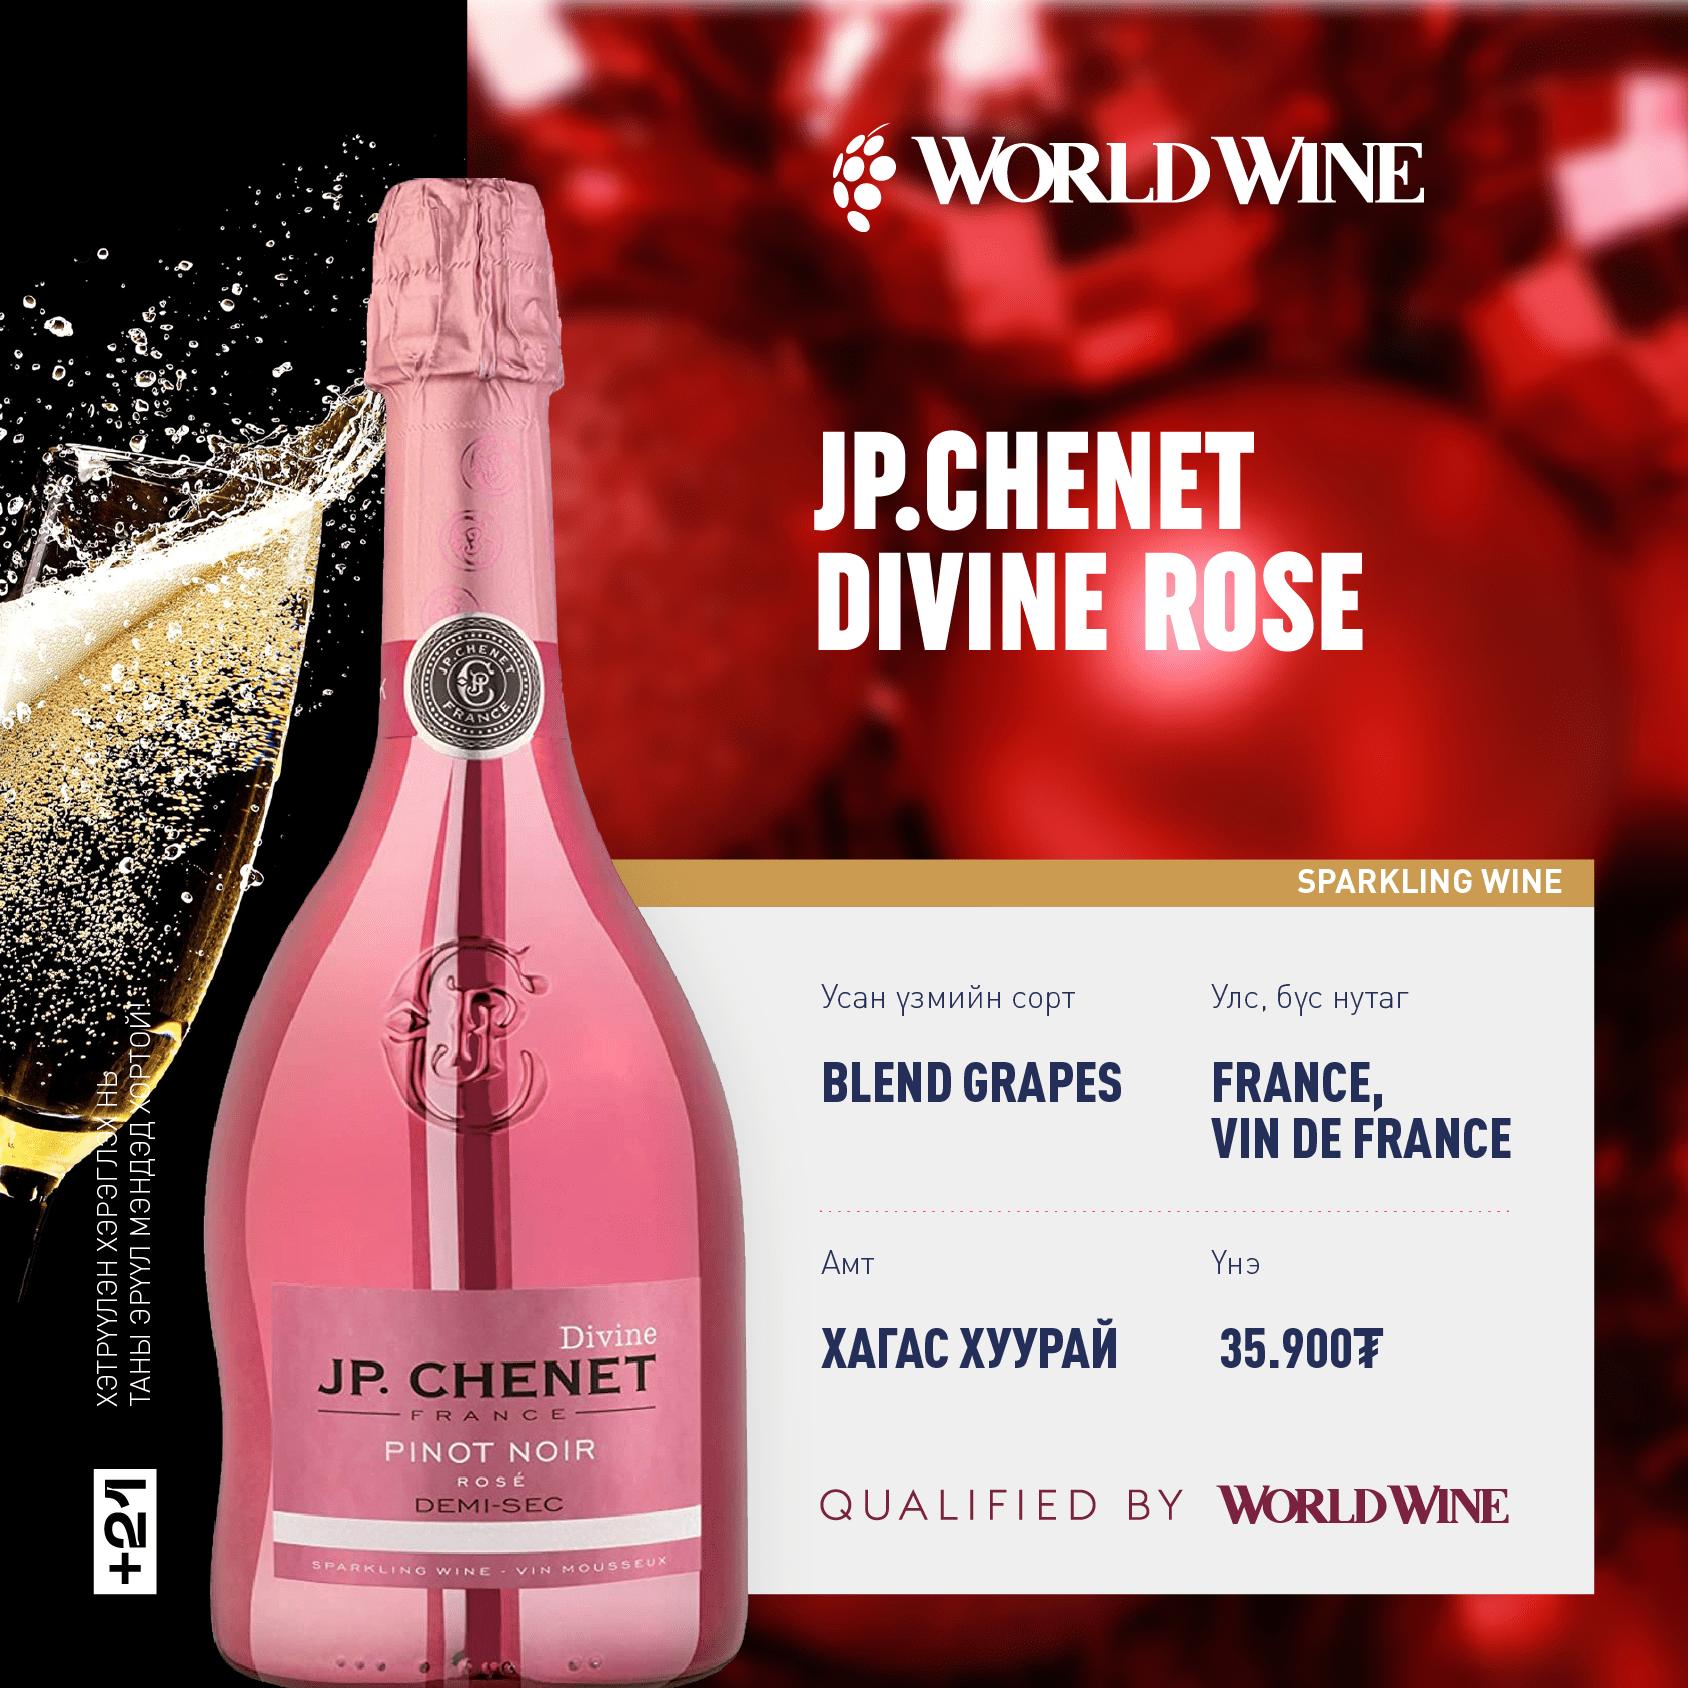 jp.chenet divine rose-11